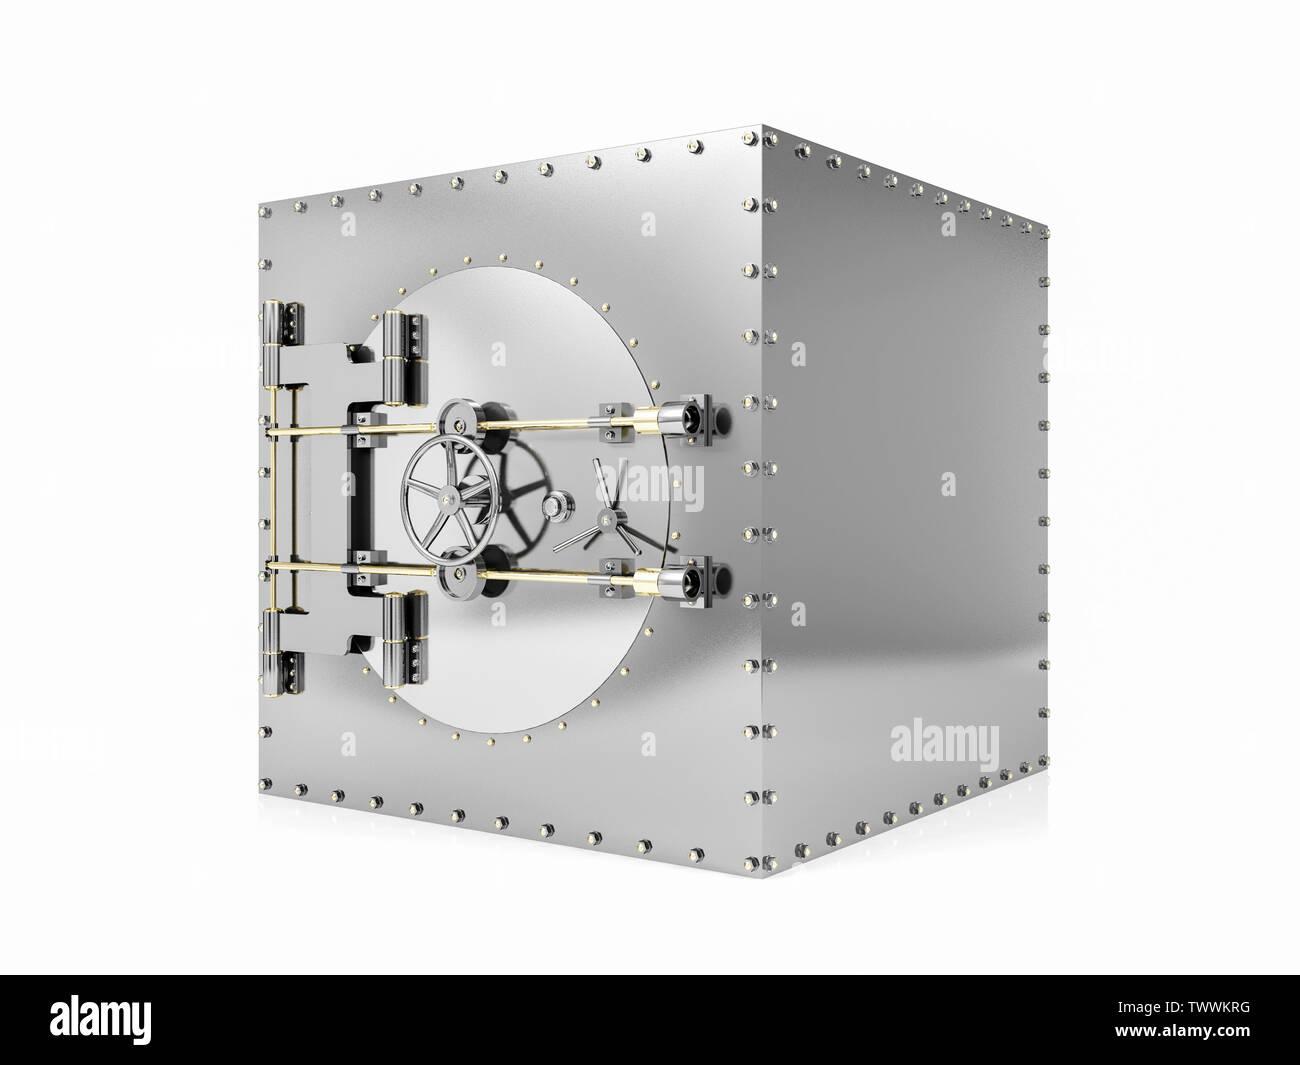 Bank safe deposit box and closed bank vault door, 3D Rendering - Stock Image